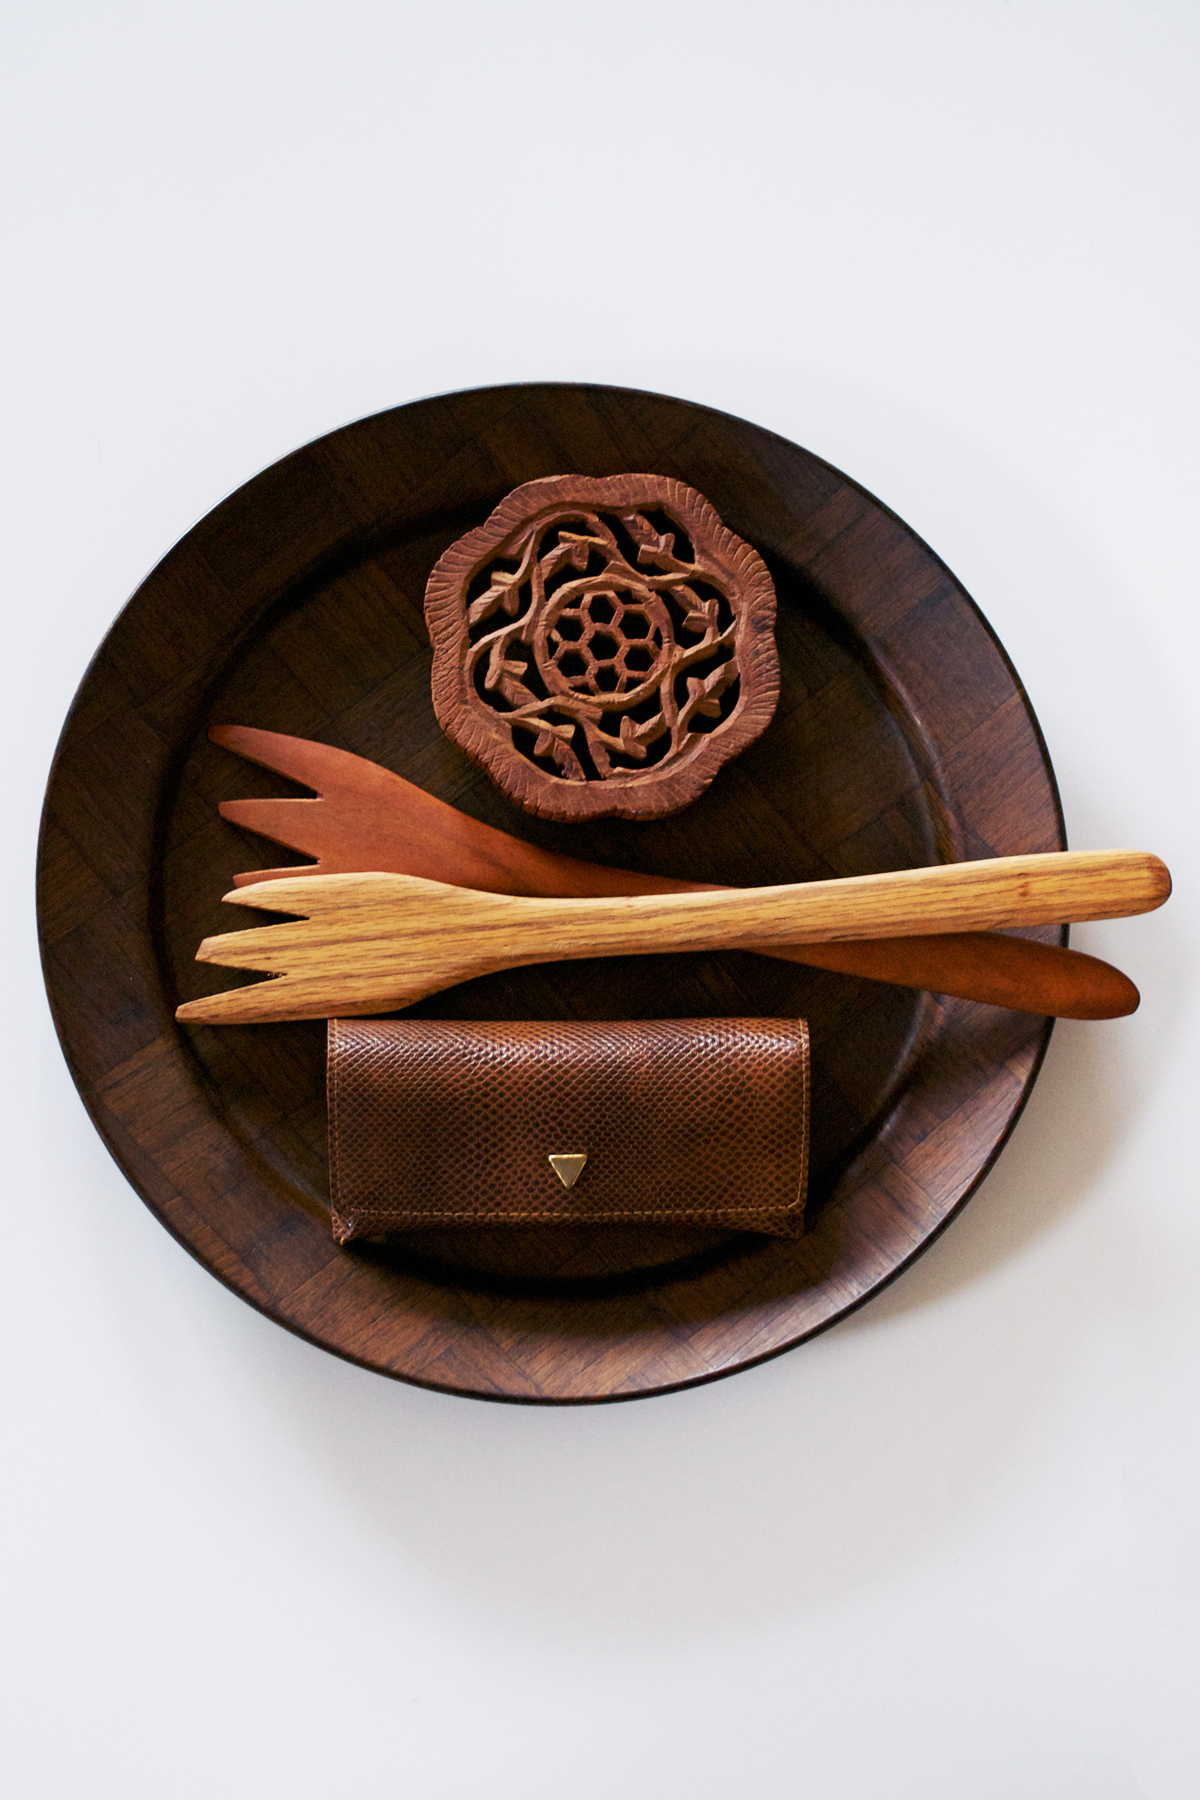 Pictured: Wooden Platter, Handmade Amish Utensils, Wooden Trivet, Brown Eyeglass Case